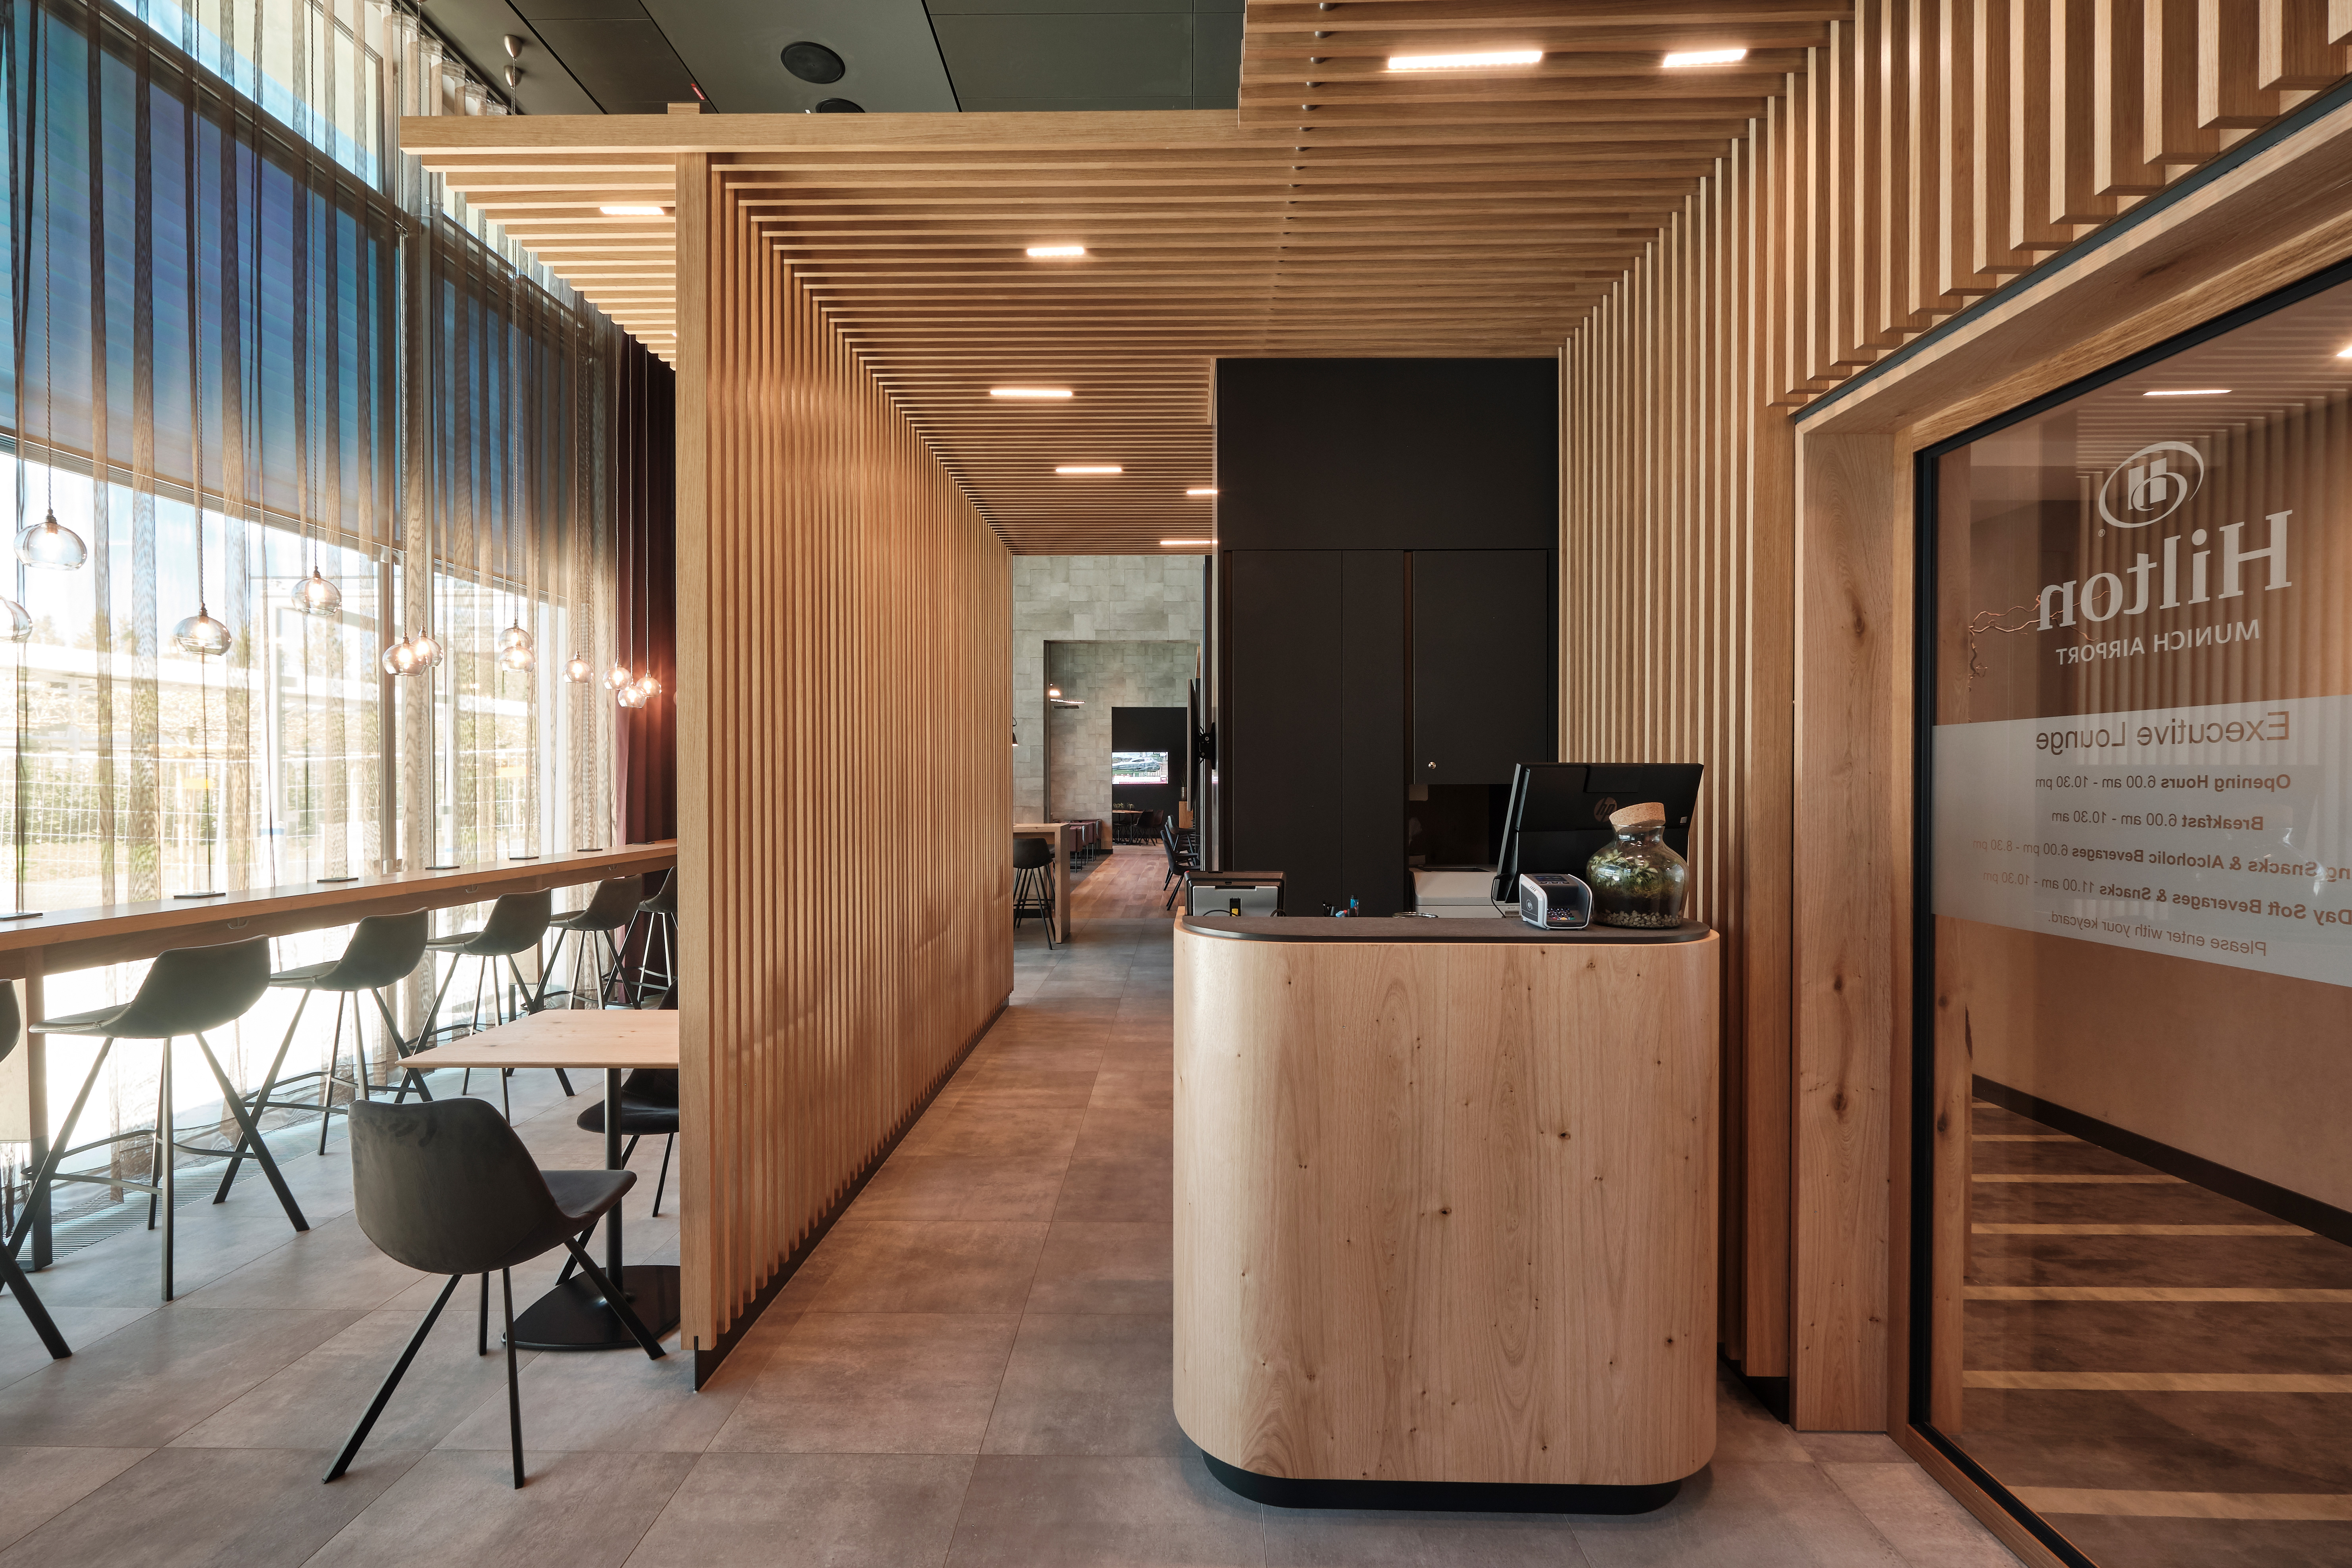 Hotel   JOI Design   Innenarchitektur   Interior Design ...